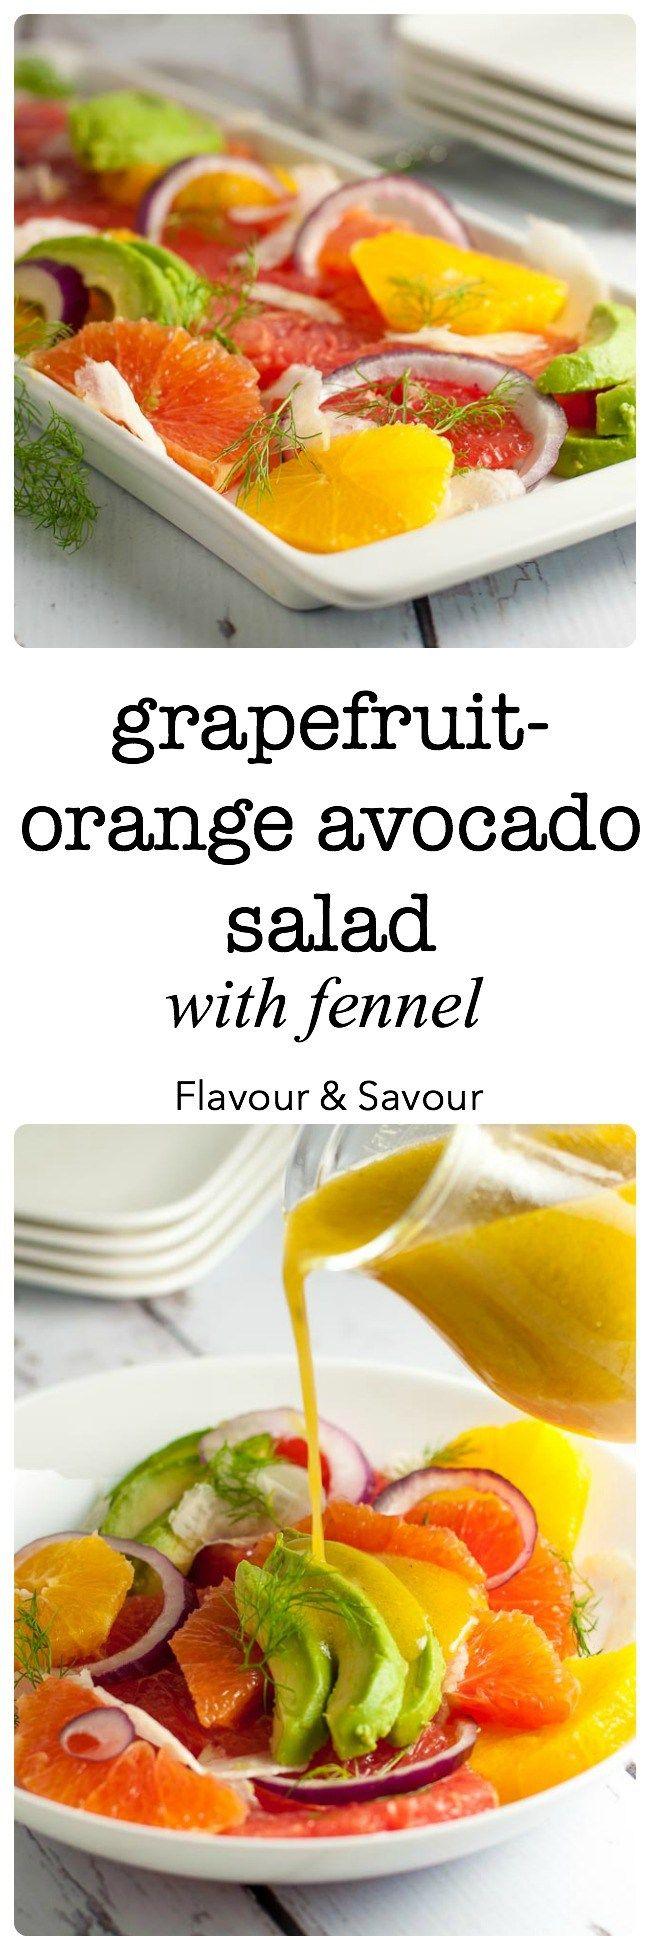 Grapefruit-Orange Avocado Salad with Fennel. Banish the winter blues ...